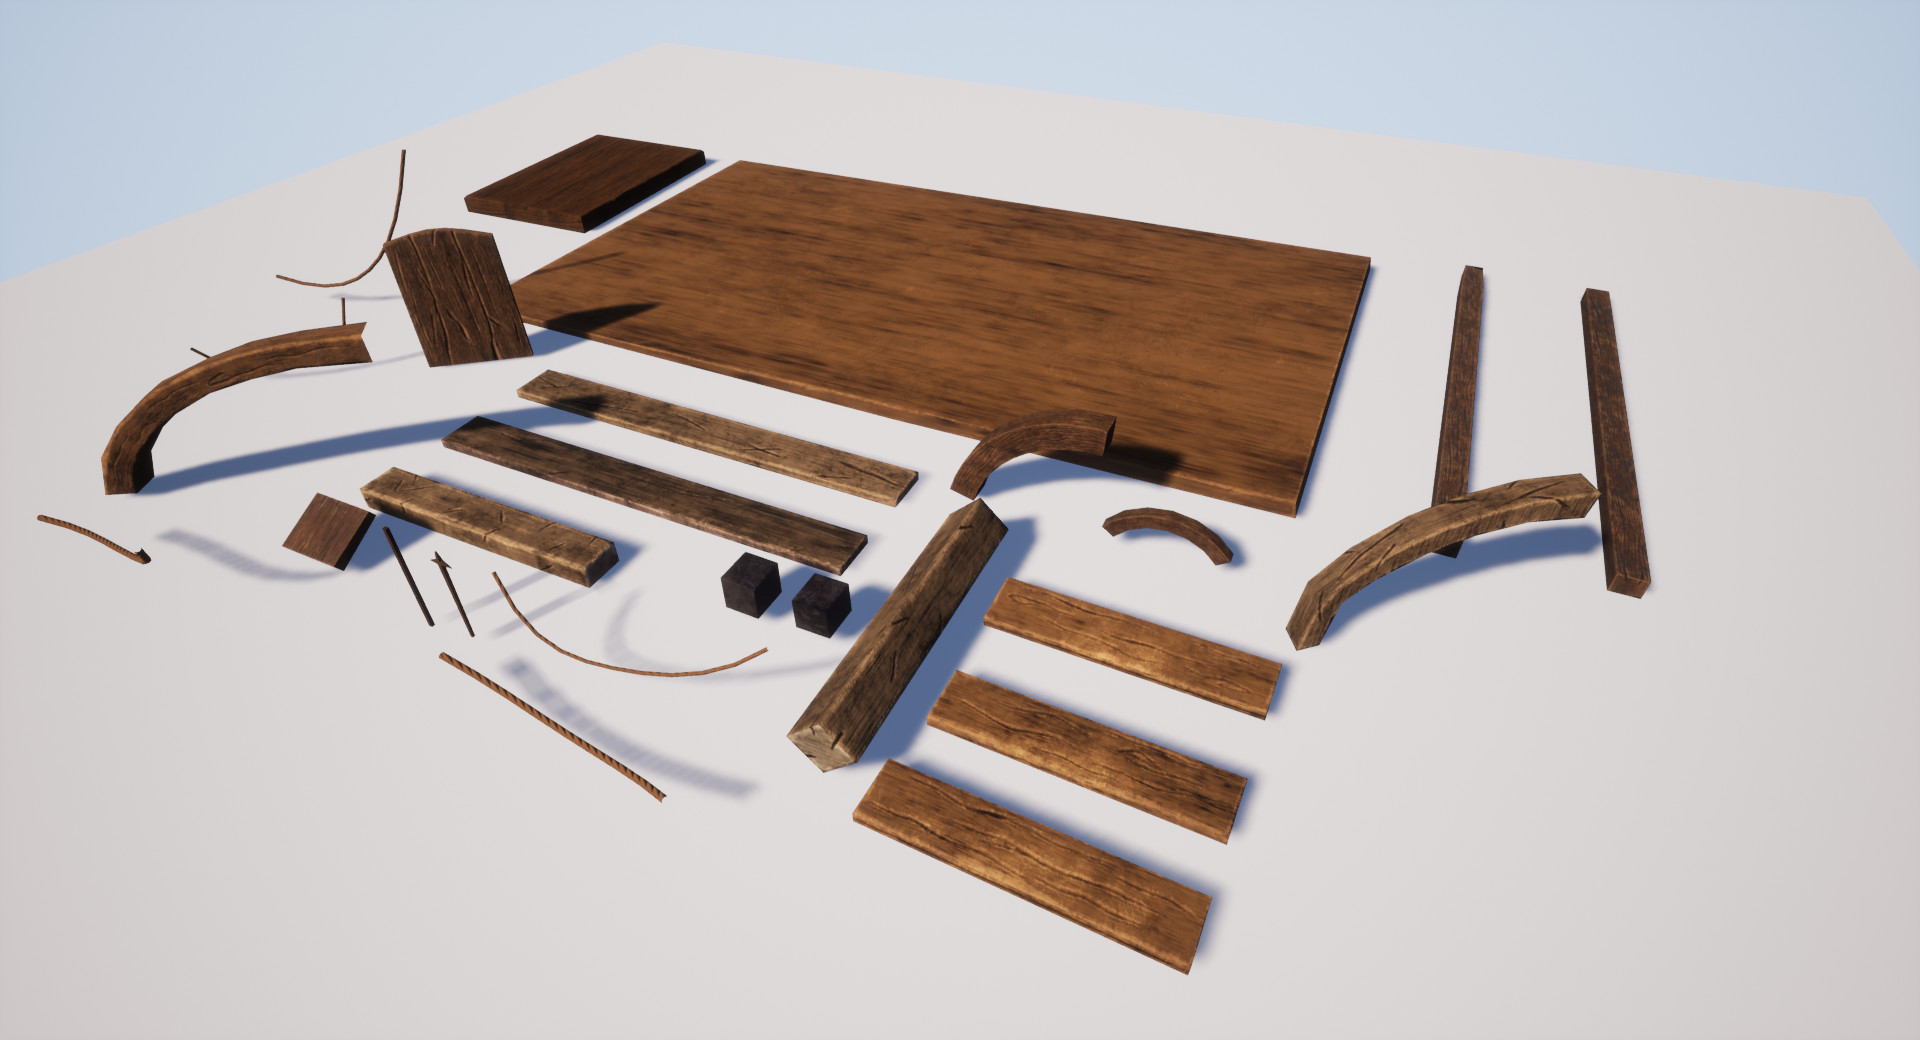 Allan penafort modular pieces 01